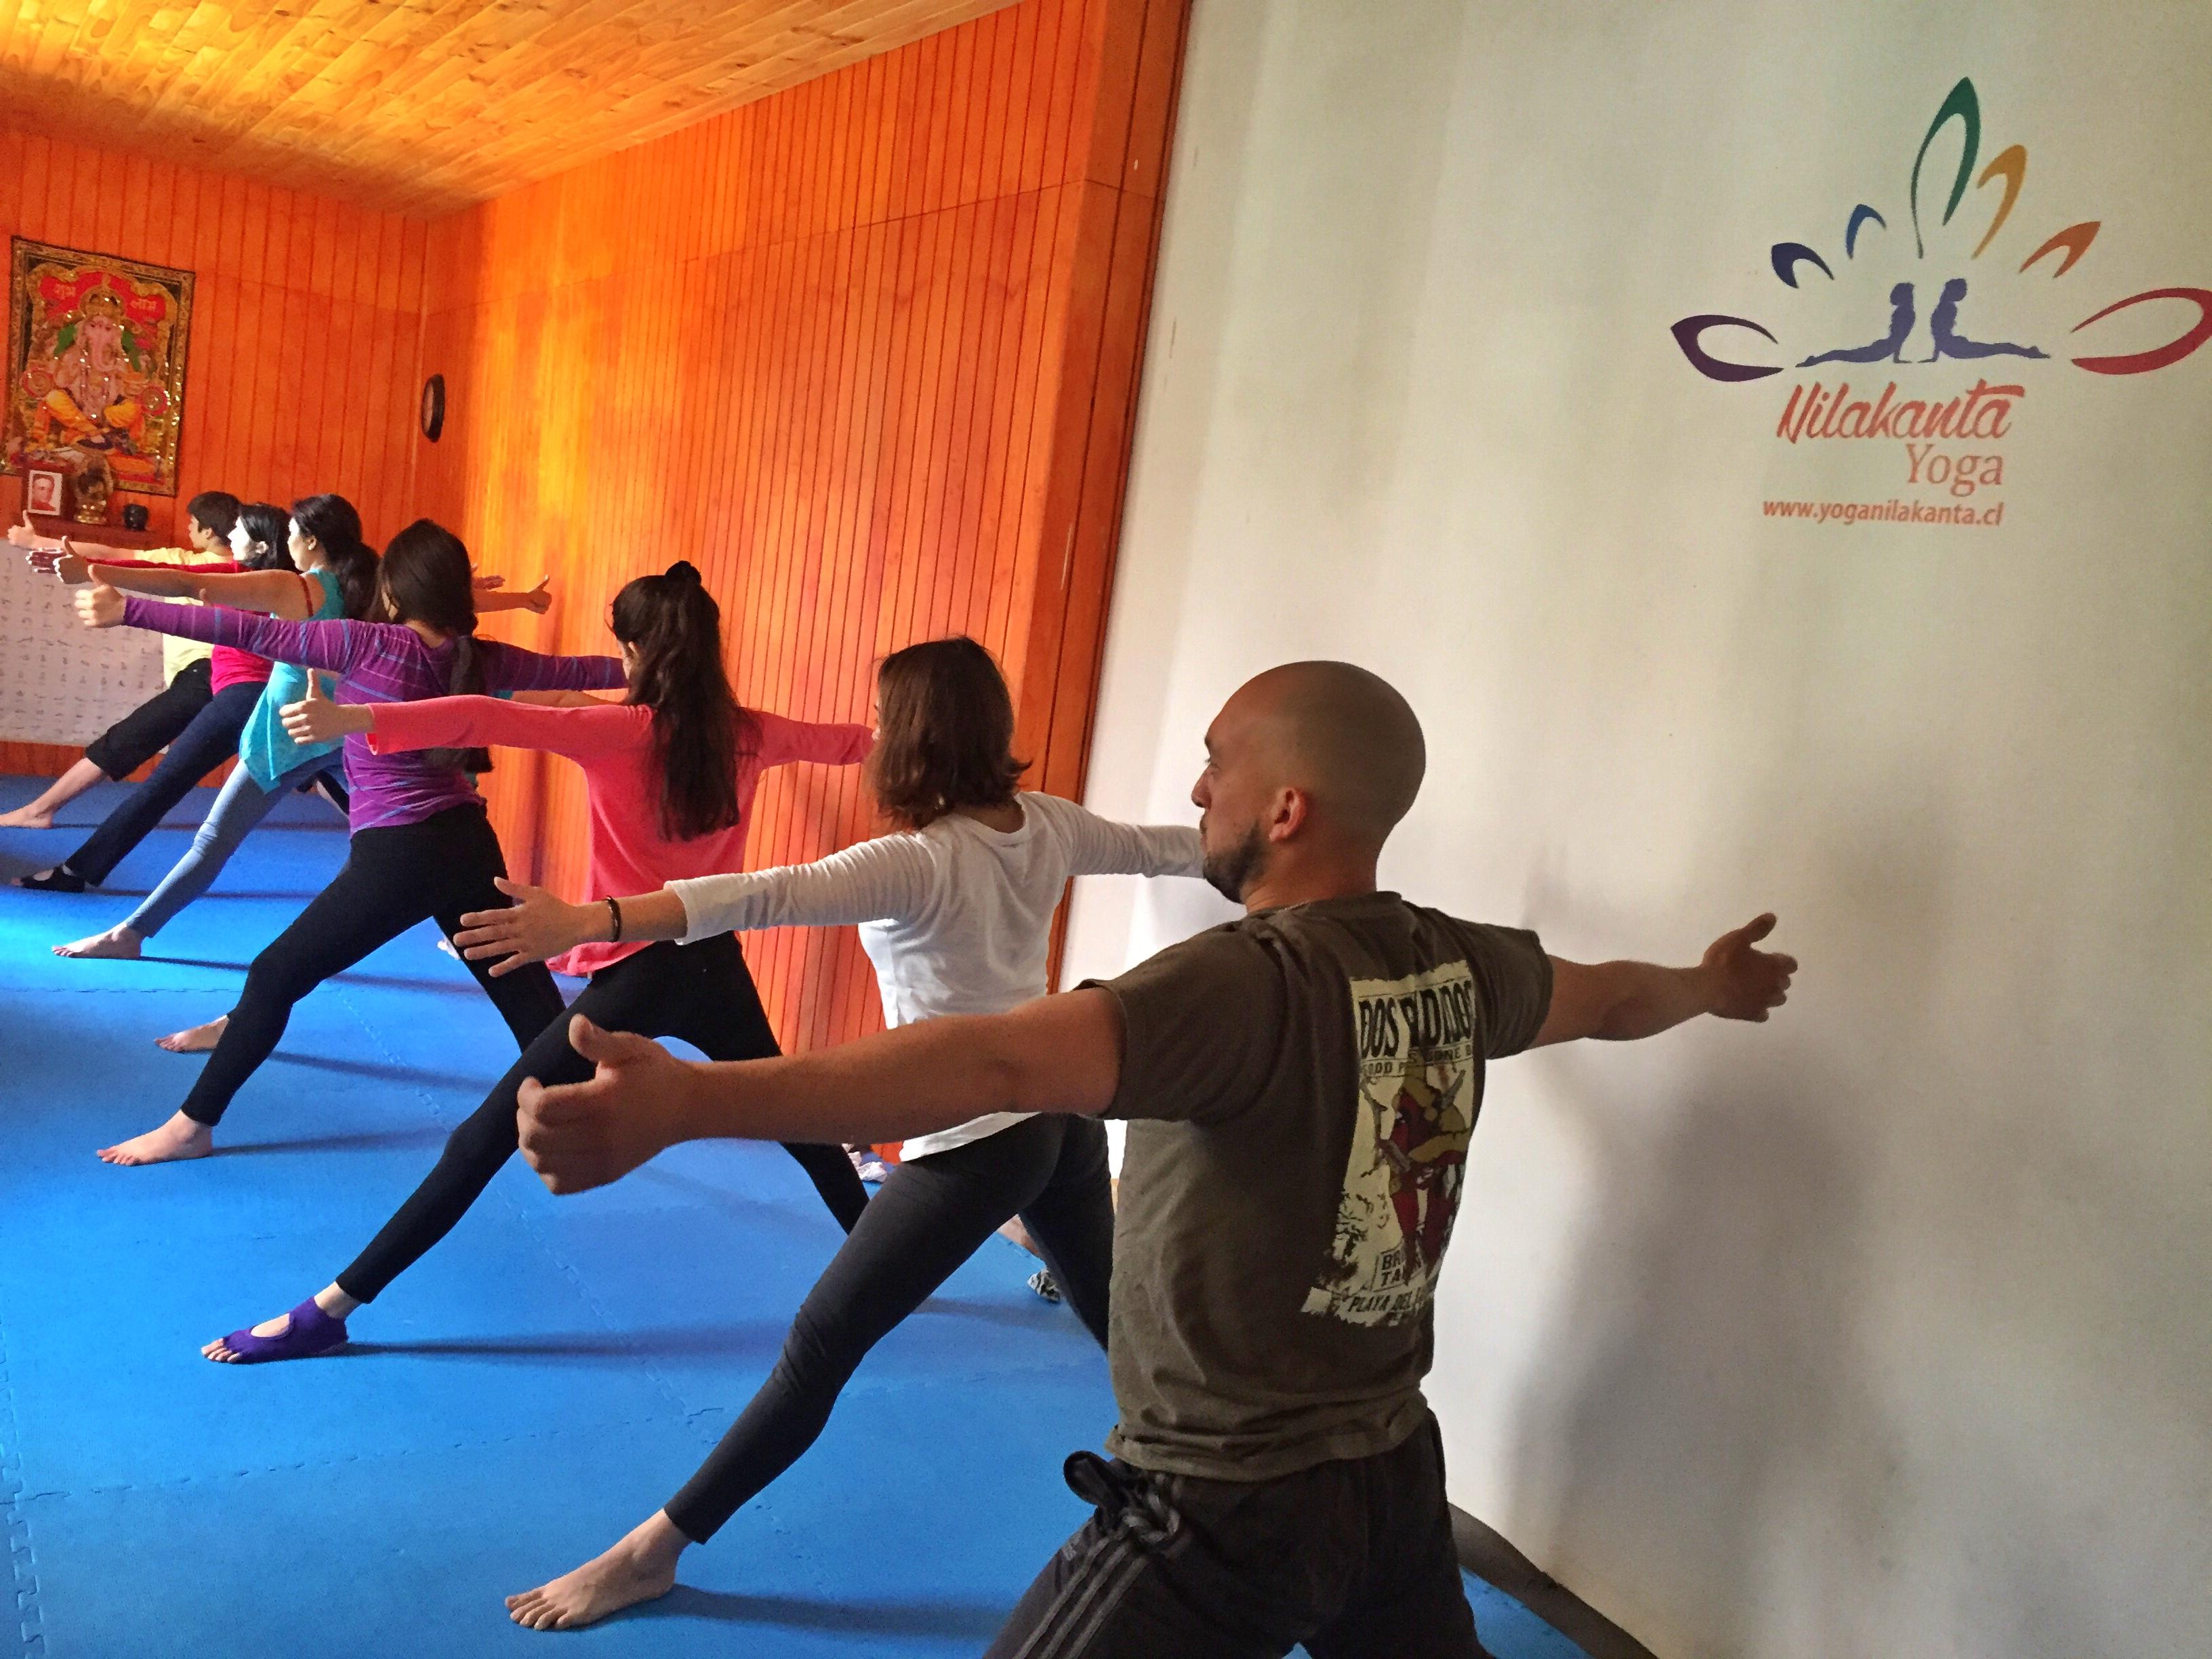 Gemoterapia en Yoga Nilakanta